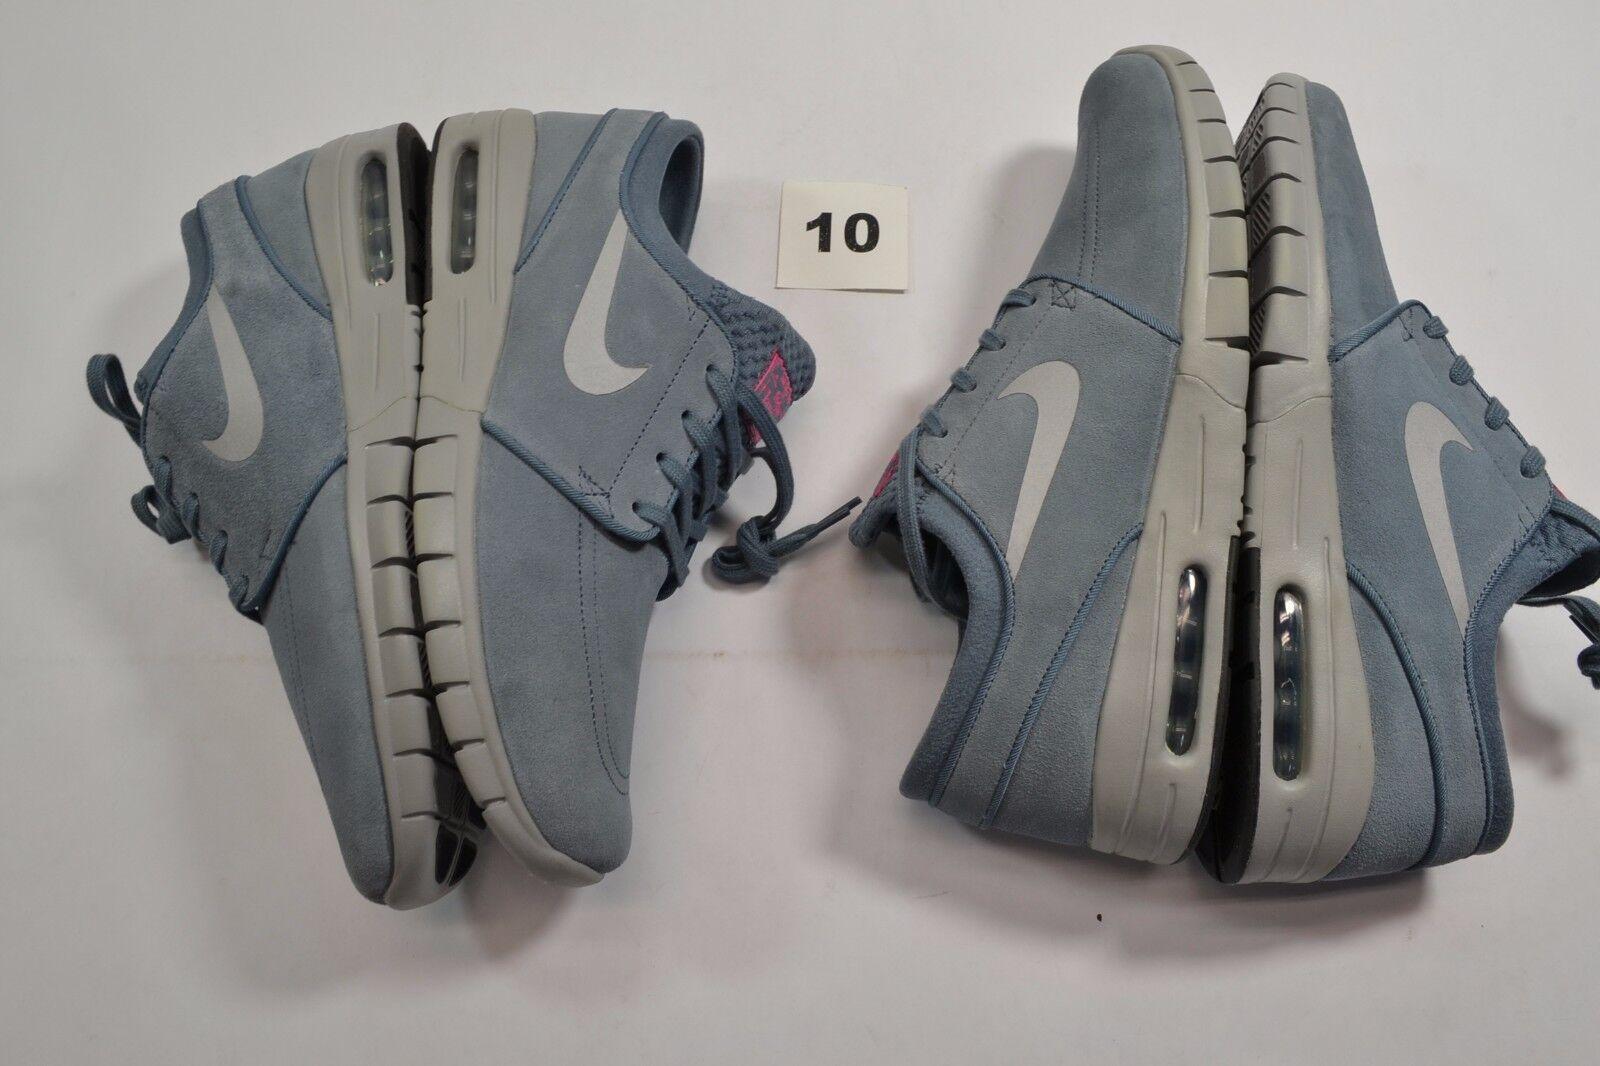 Nike STEFAN JANOSKI L MAX L JANOSKI Bleu Graphite Metallic Discounted (495) homme chaussures 9cdcc5